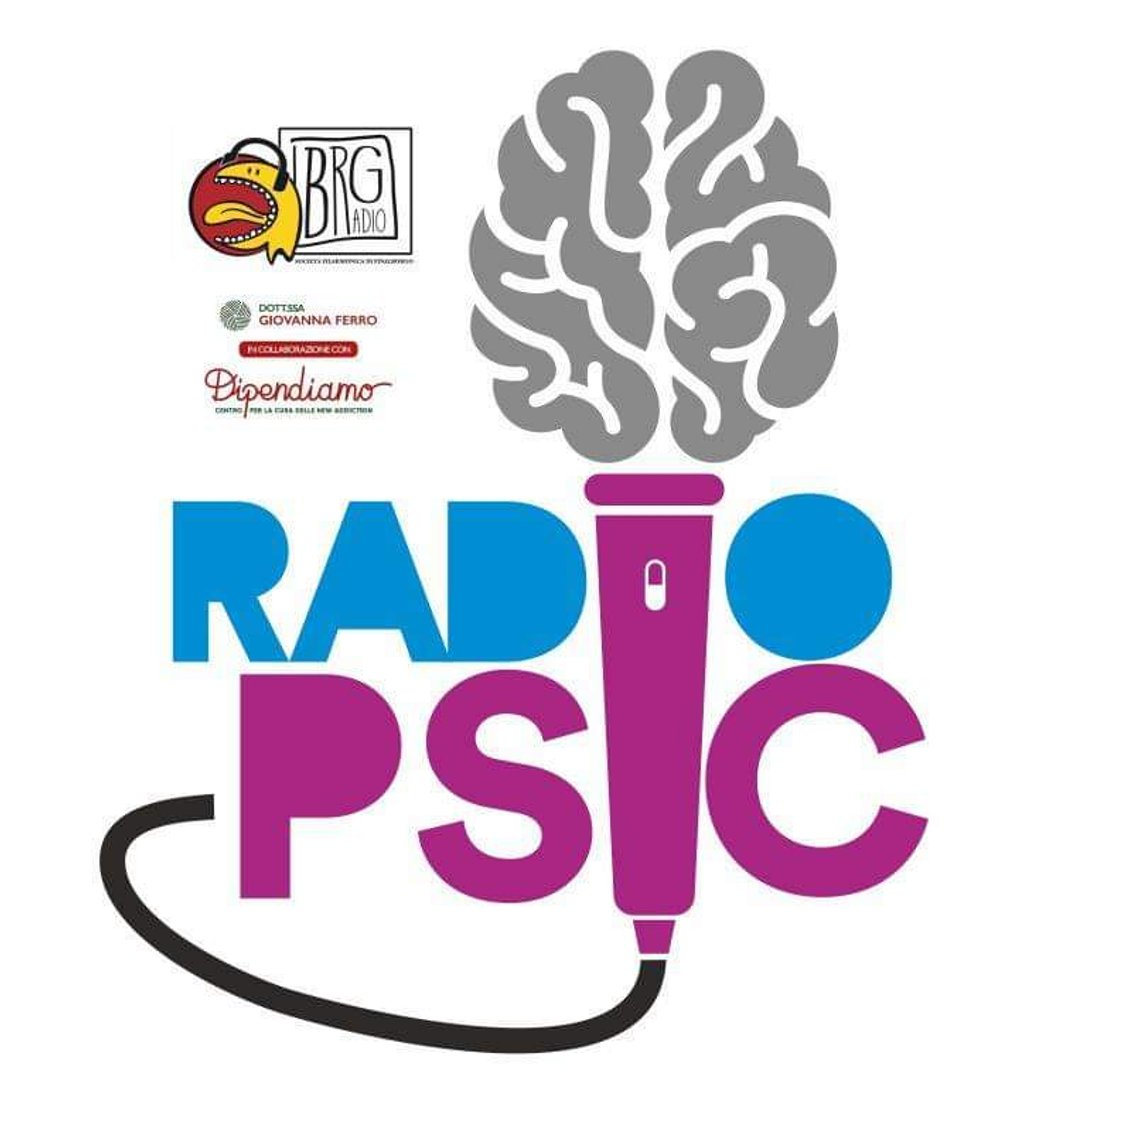 Radio Psic - immagine di copertina